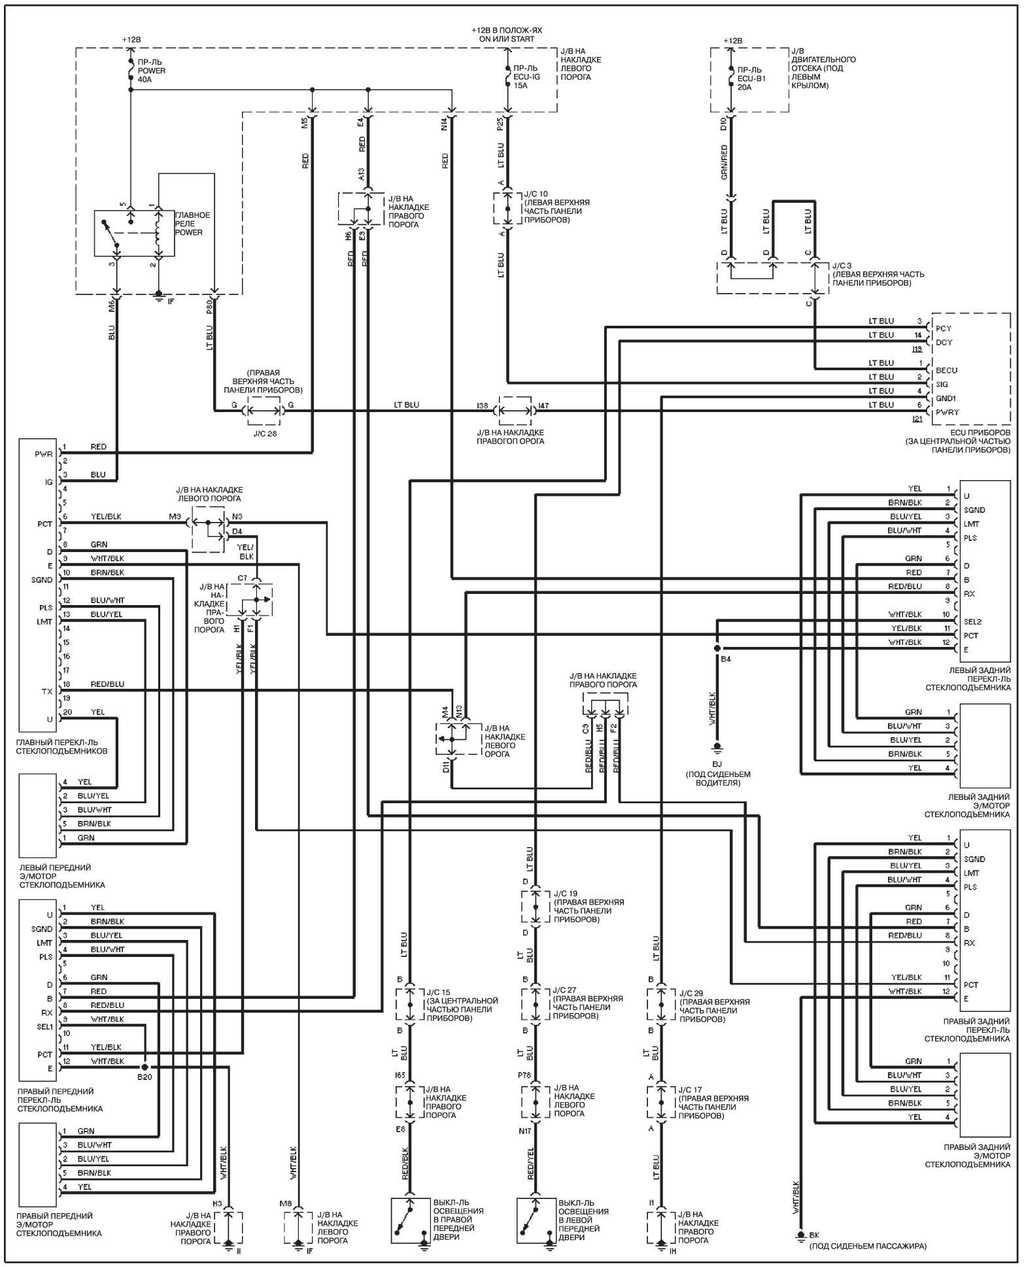 Схема всей электропроводки ленд крузера 100